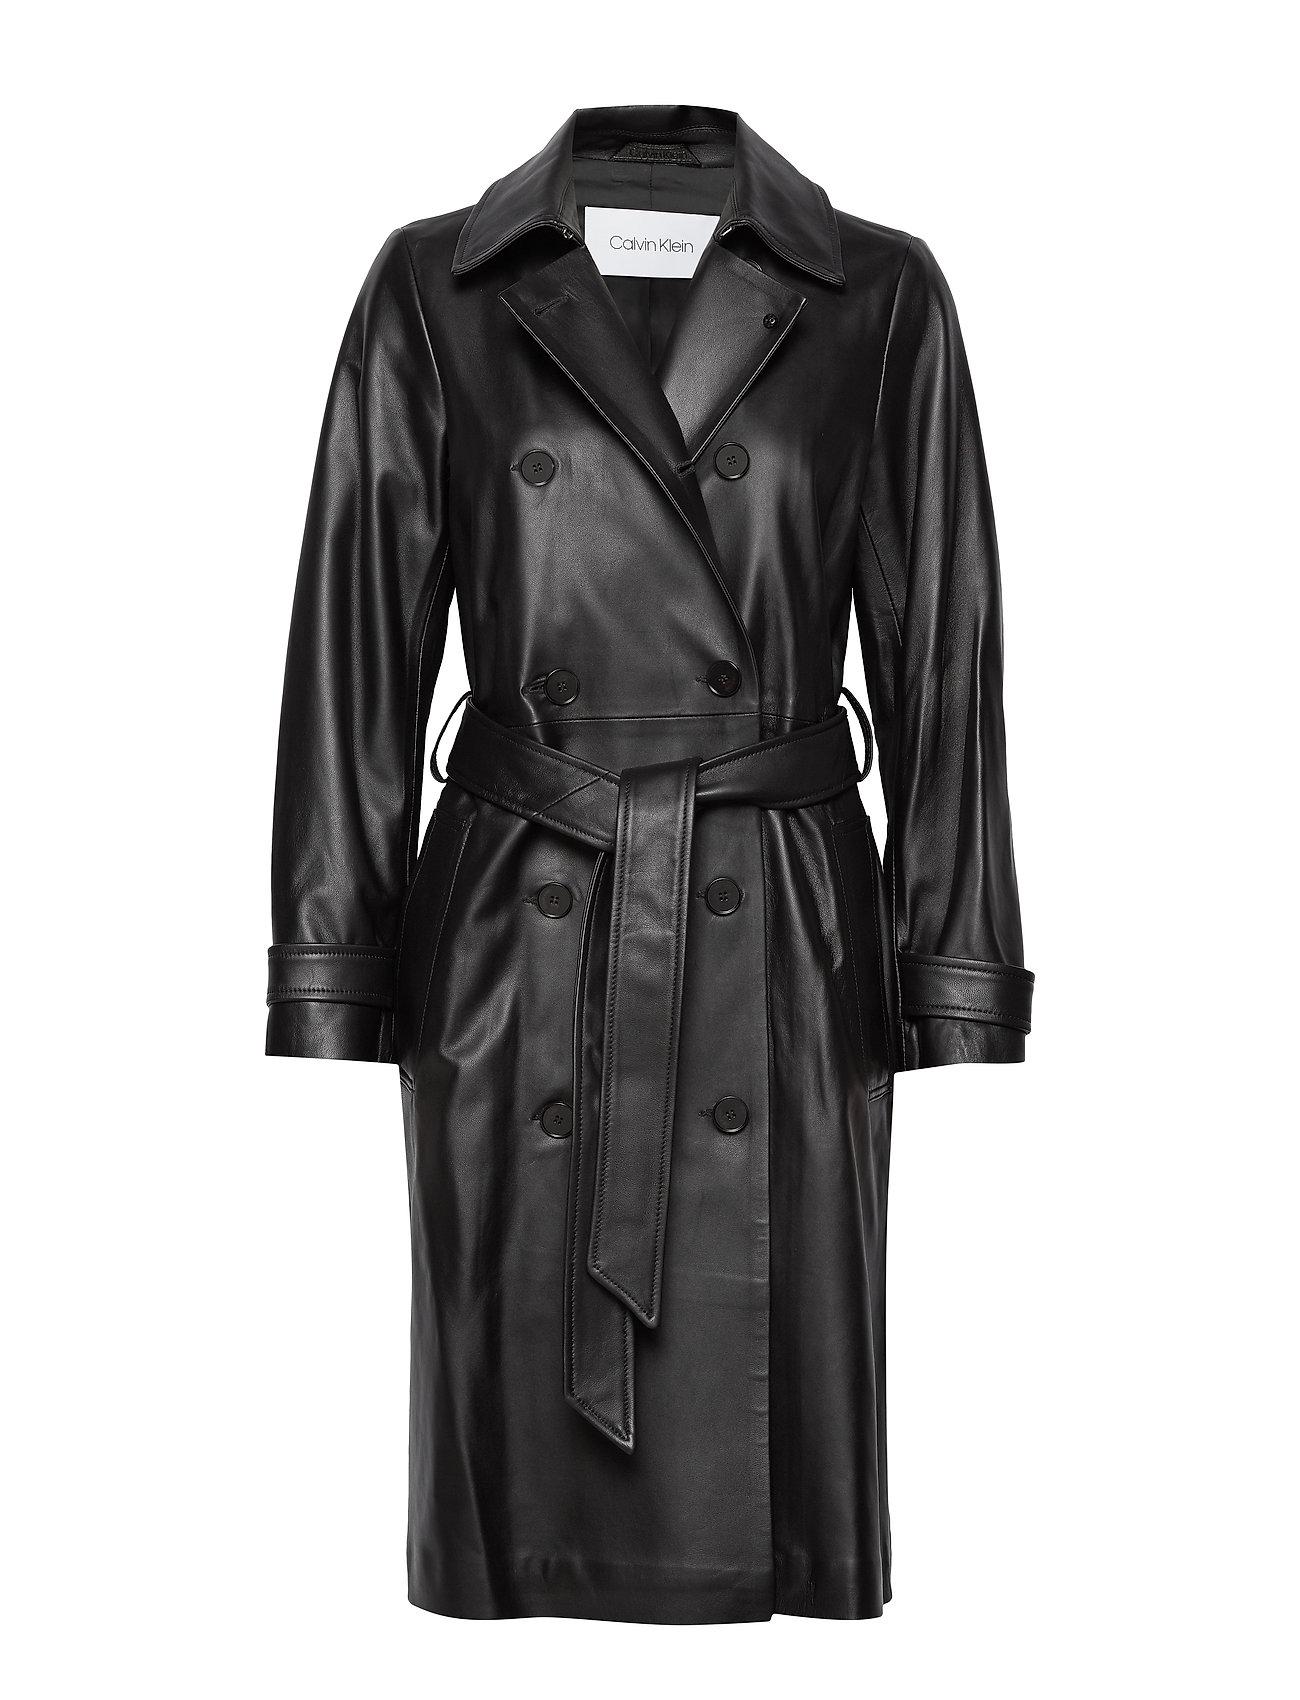 Calvin Klein LEATHER TRENCH COAT - CALVIN BLACK